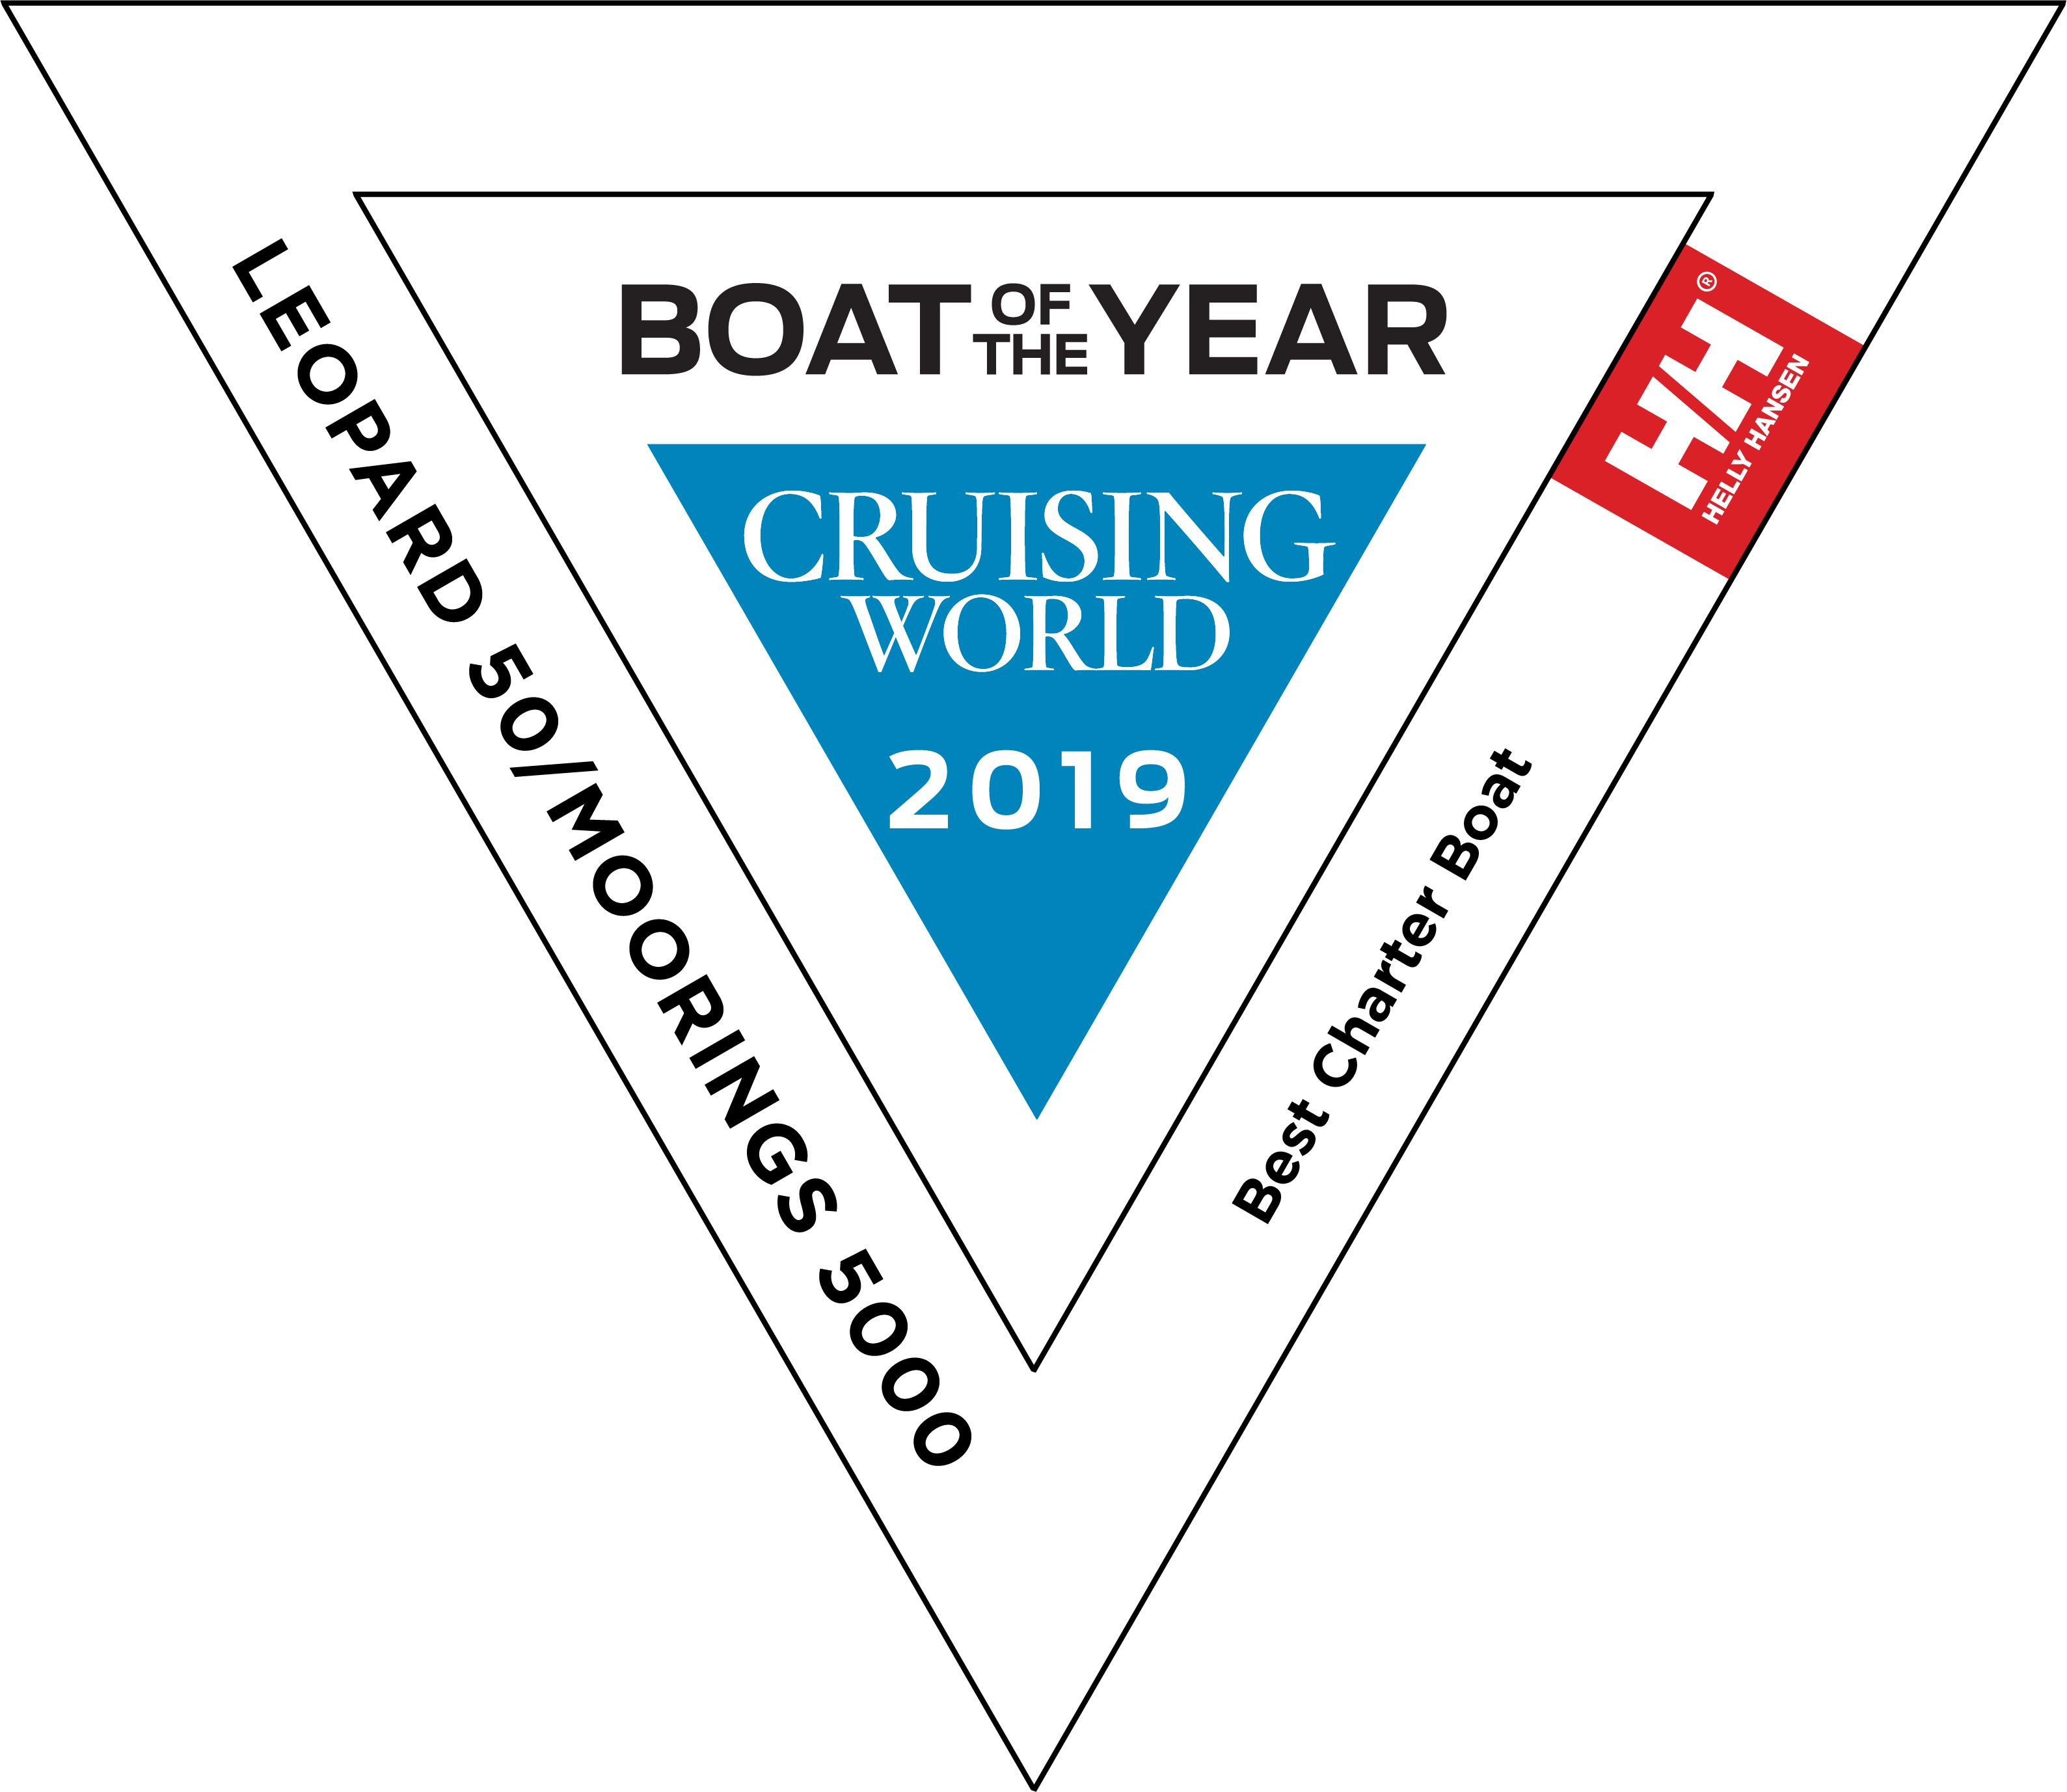 Moorings 5000 - Boat Of The Year